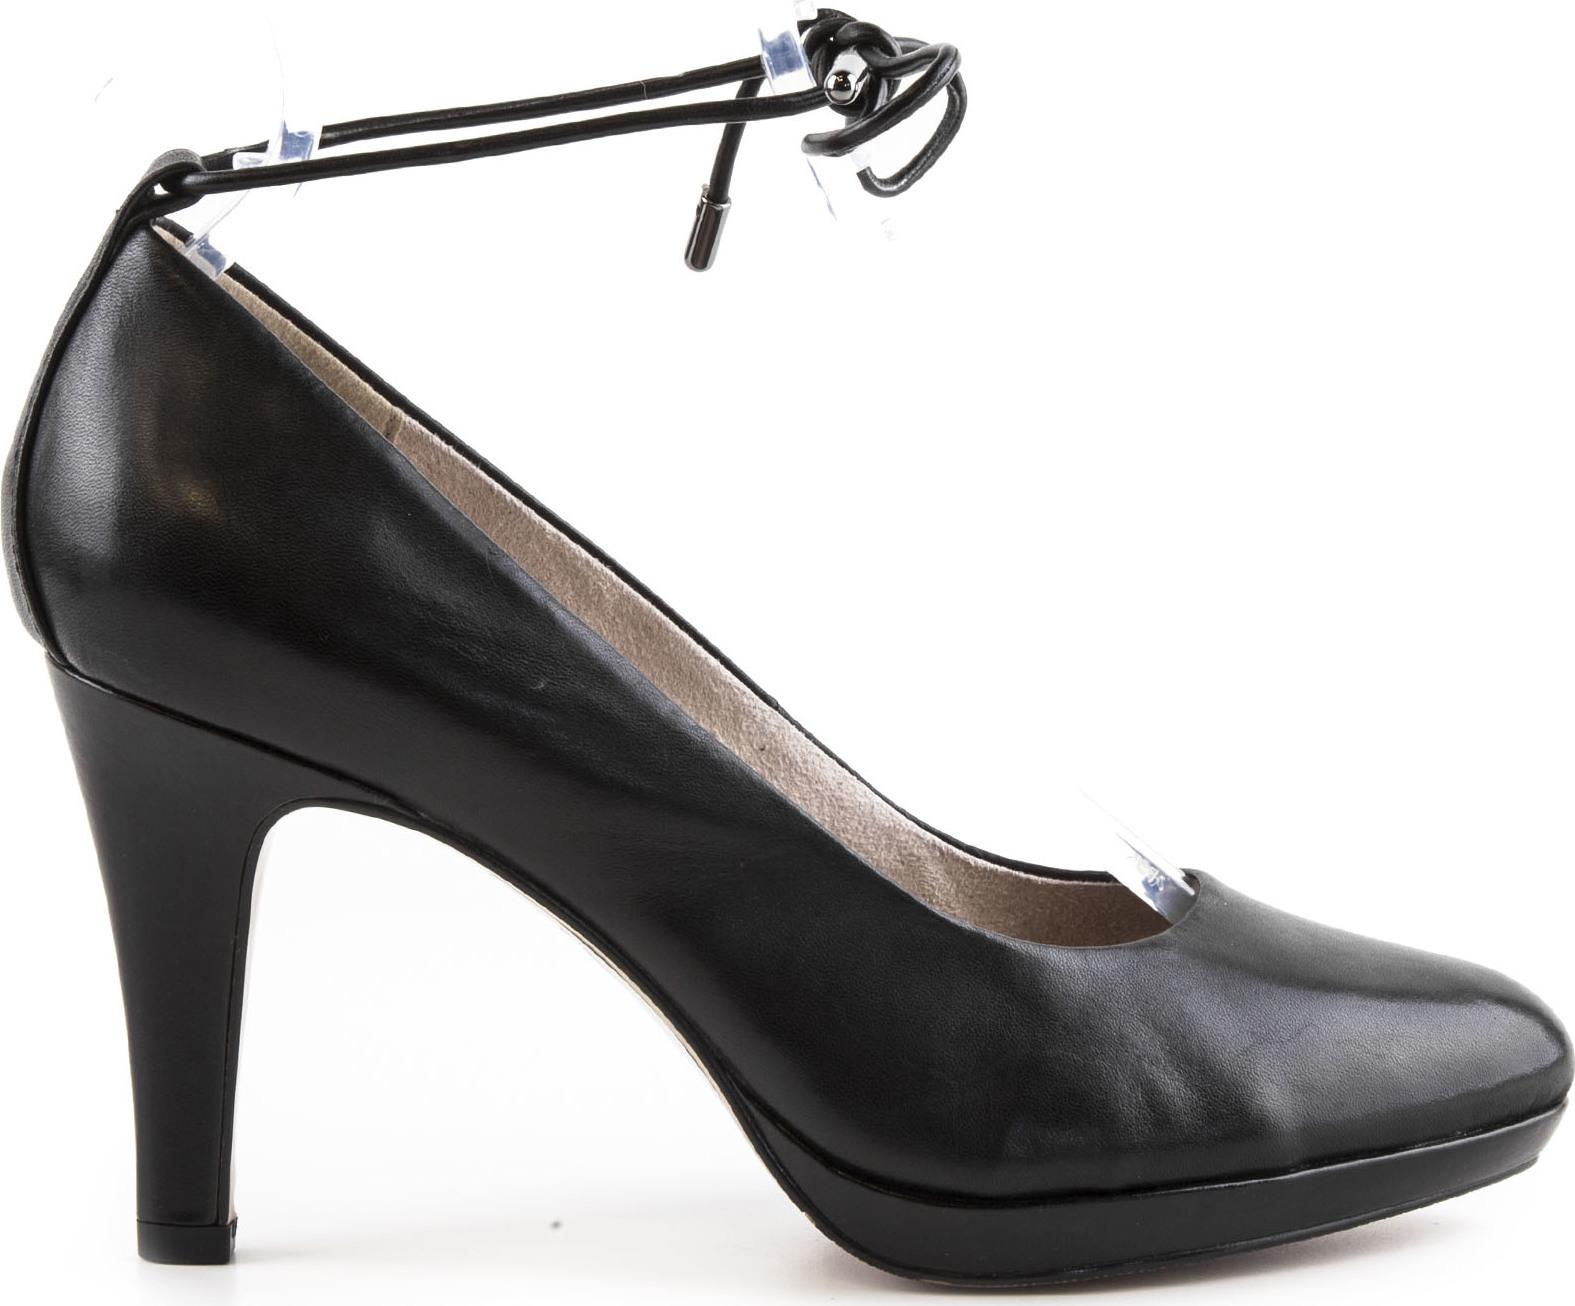 Ccc obuv havířov kaufland » bfcc88d3d51